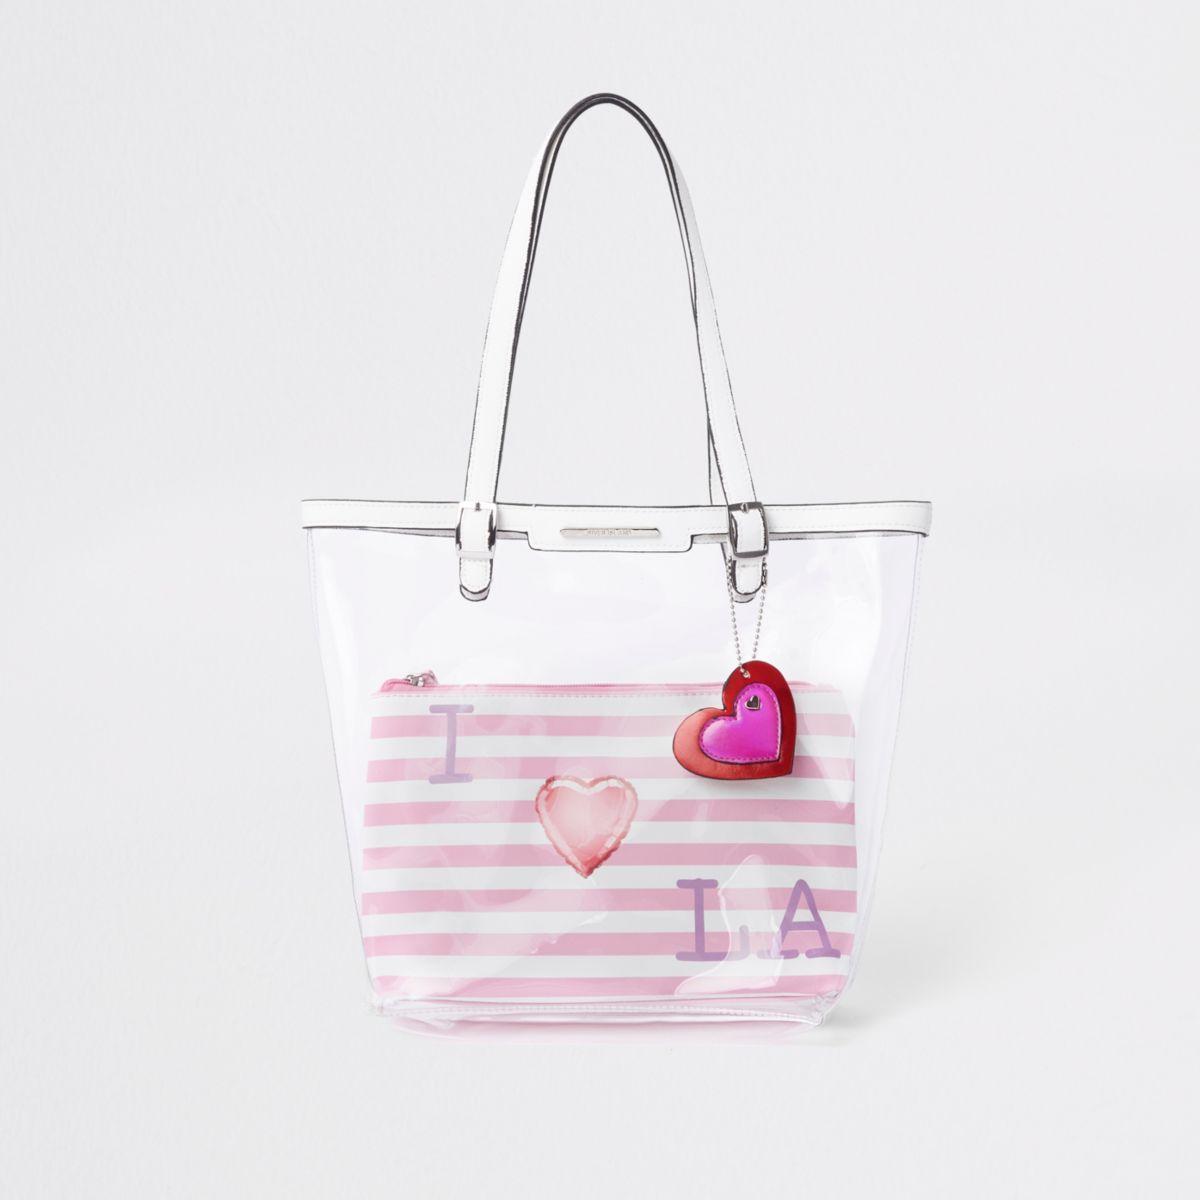 Girls pink clear 'I love LA' shopper